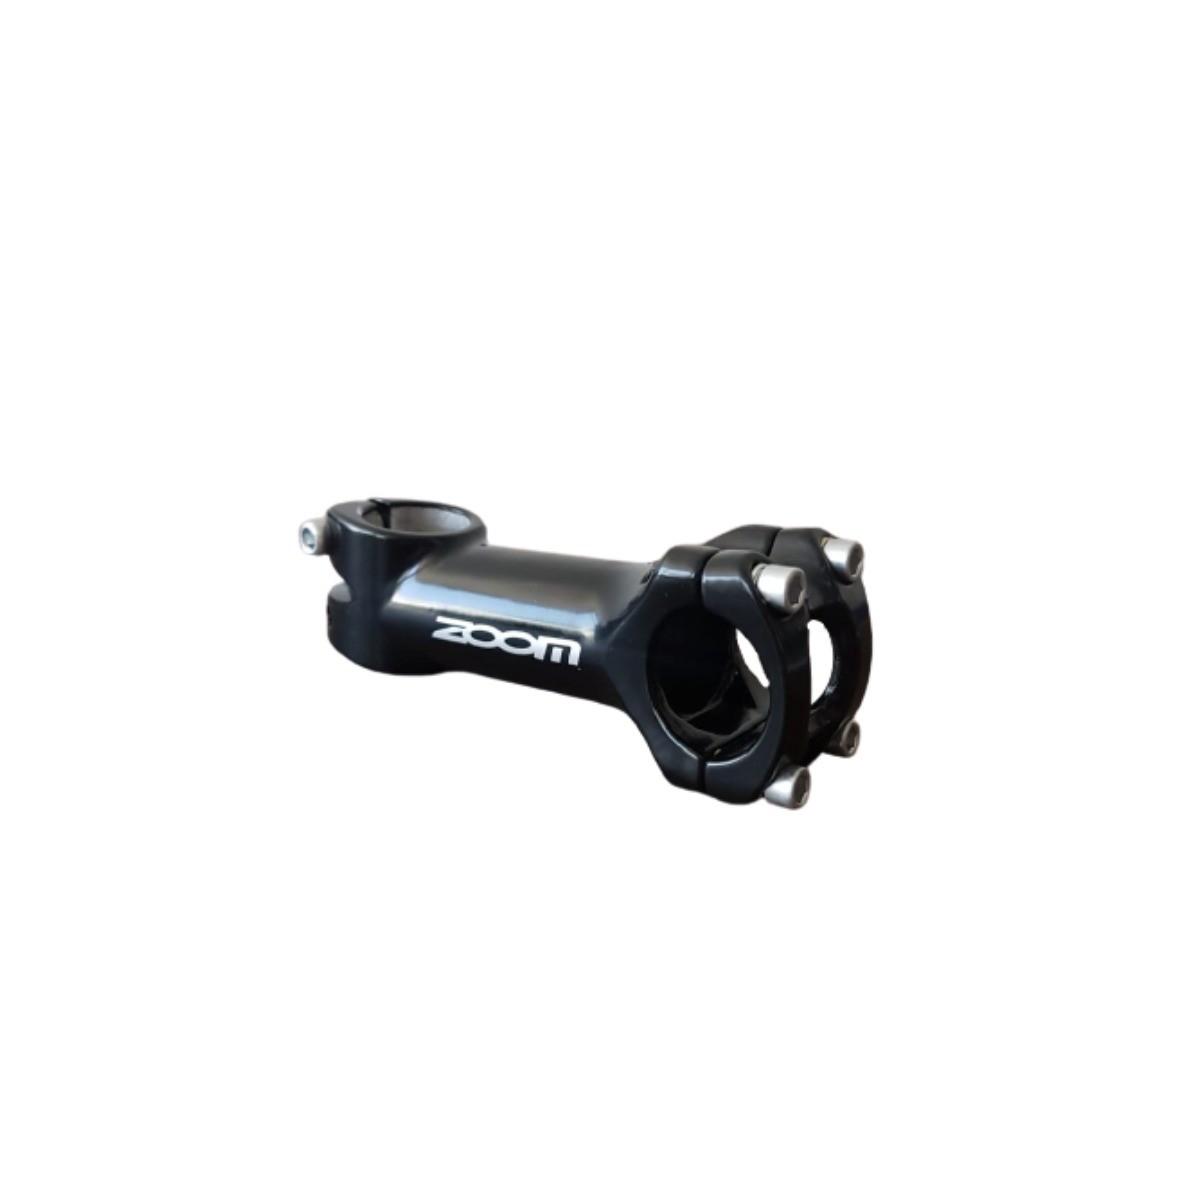 Suporte Guidão Ahead Ad286 Zoom Aluminio Preto 31,8x110mm